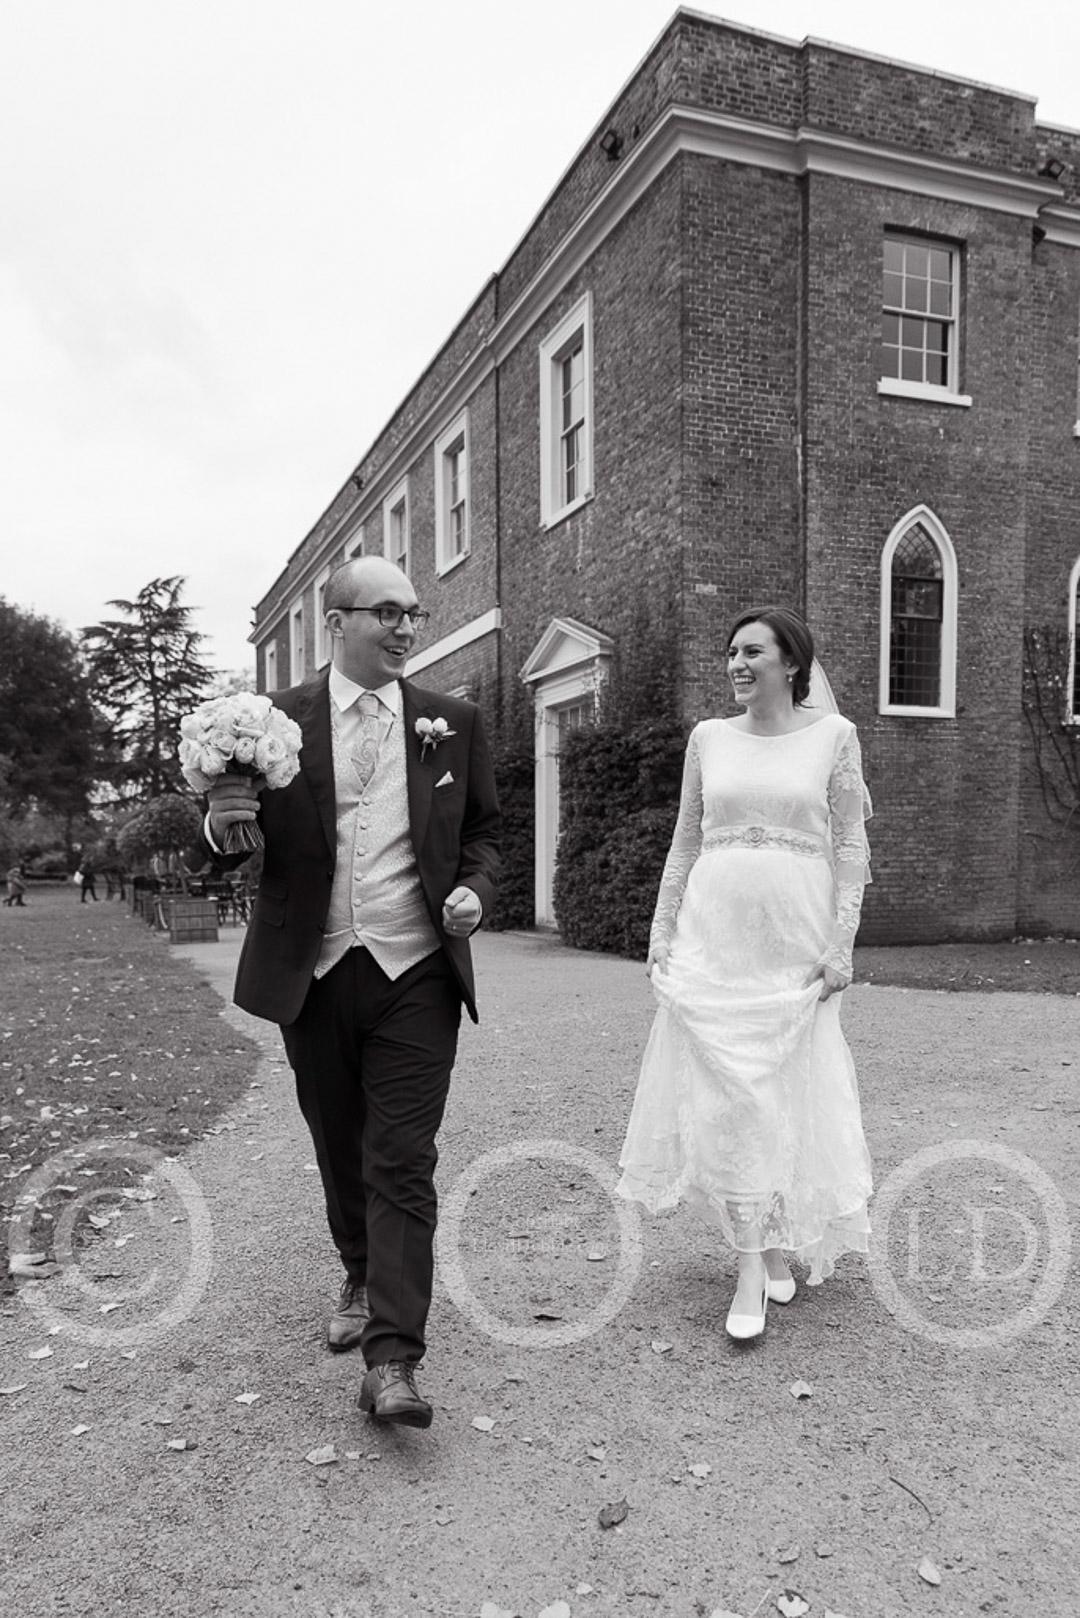 newlyweds walk away at fulham palace wedding